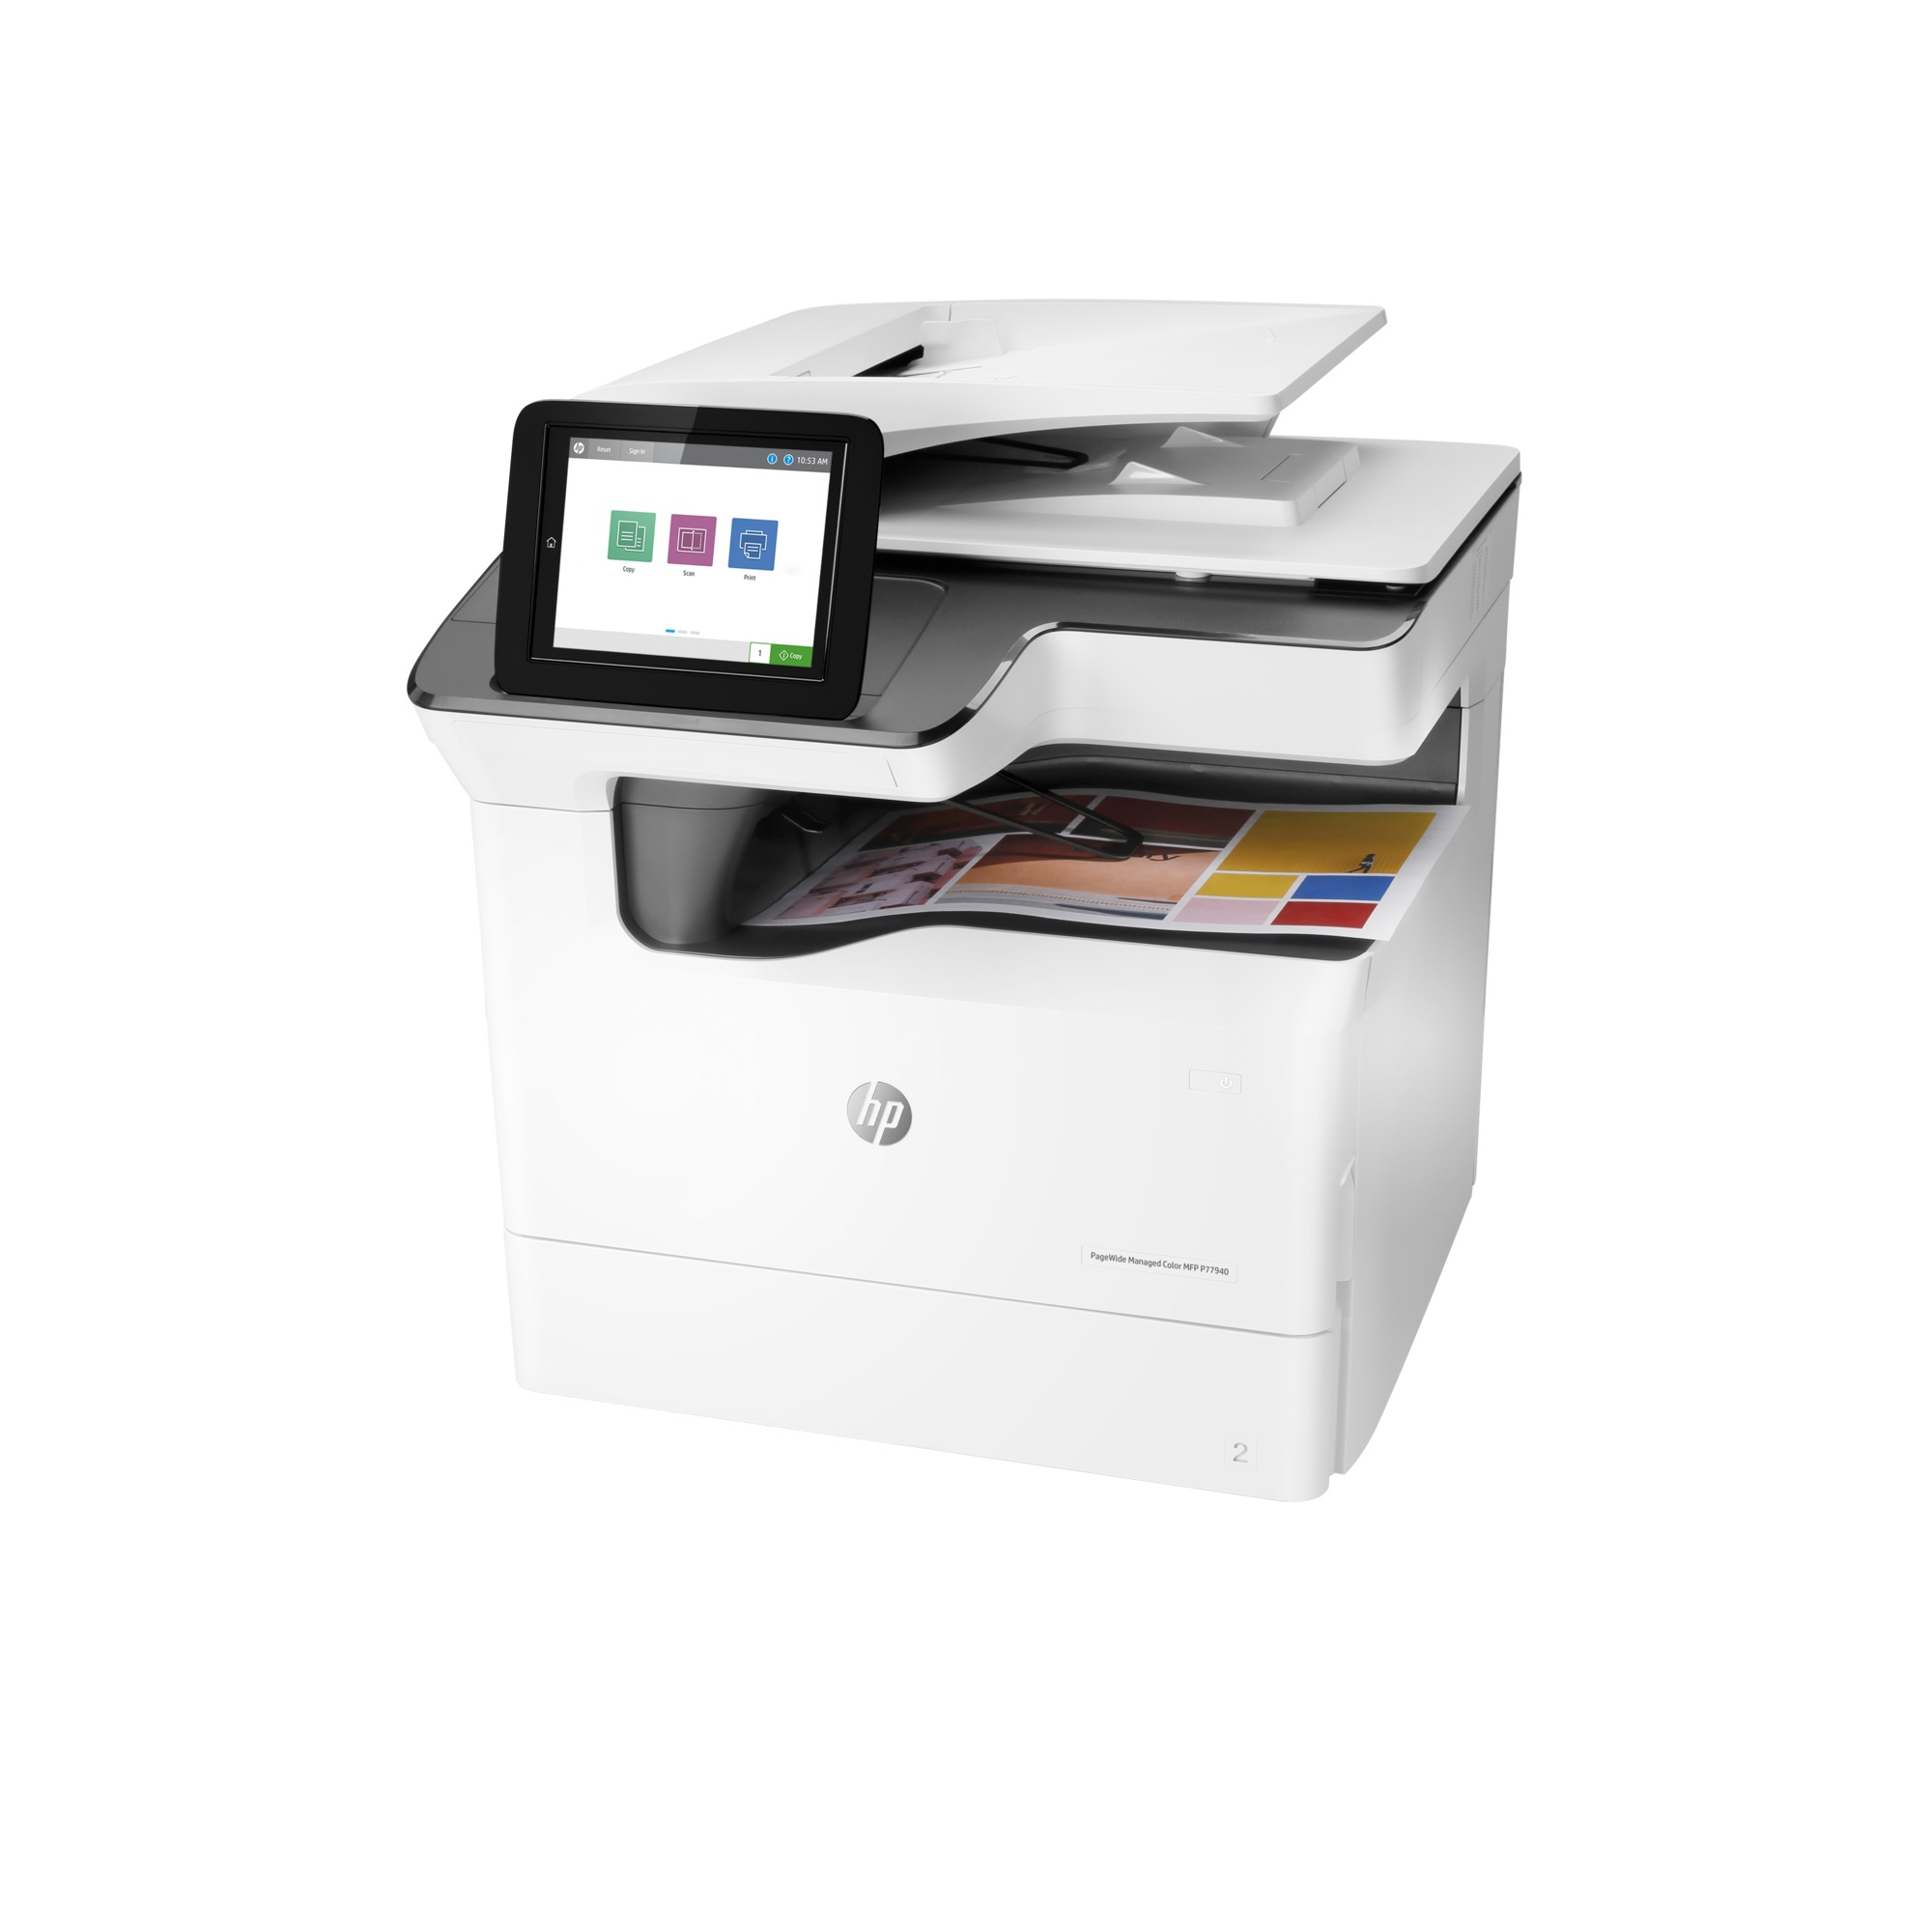 Noleggio Stampante Multifunzone HP PageWide Managed P77940dn - Lyreco print services